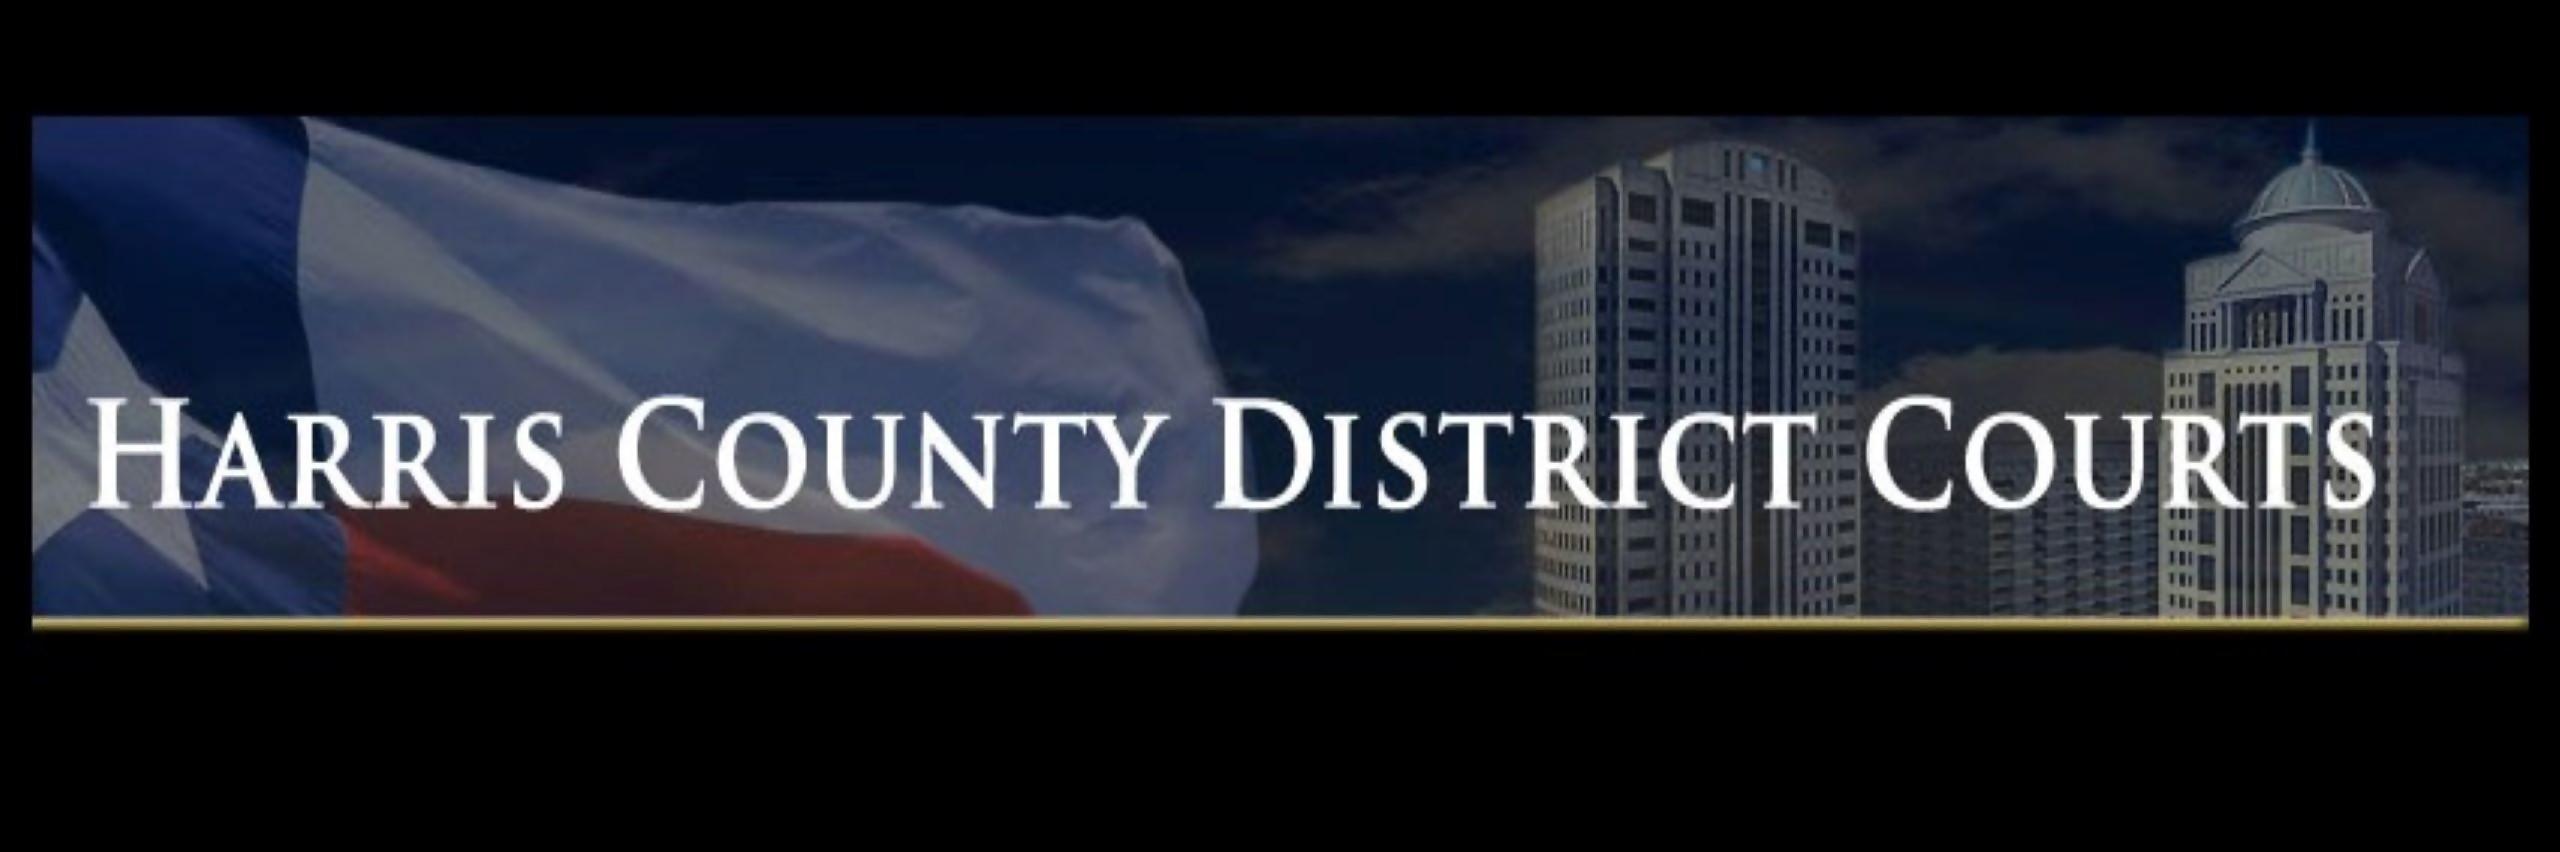 208th District Court - Live Stream